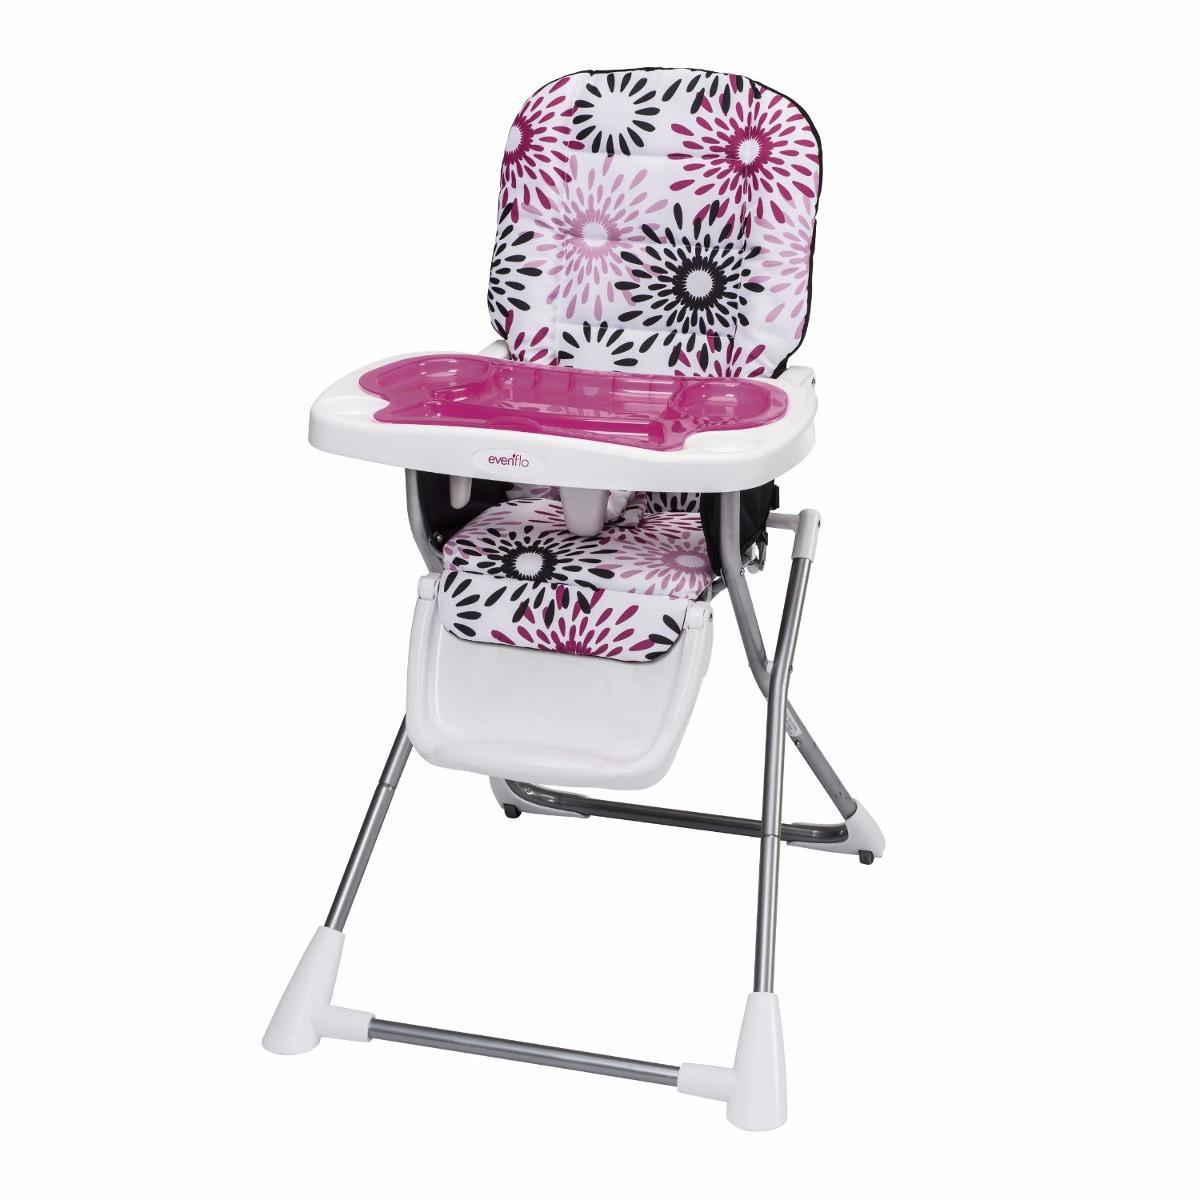 compact high chair directors silla alta sillita comer periquera bebe evenflo carolina